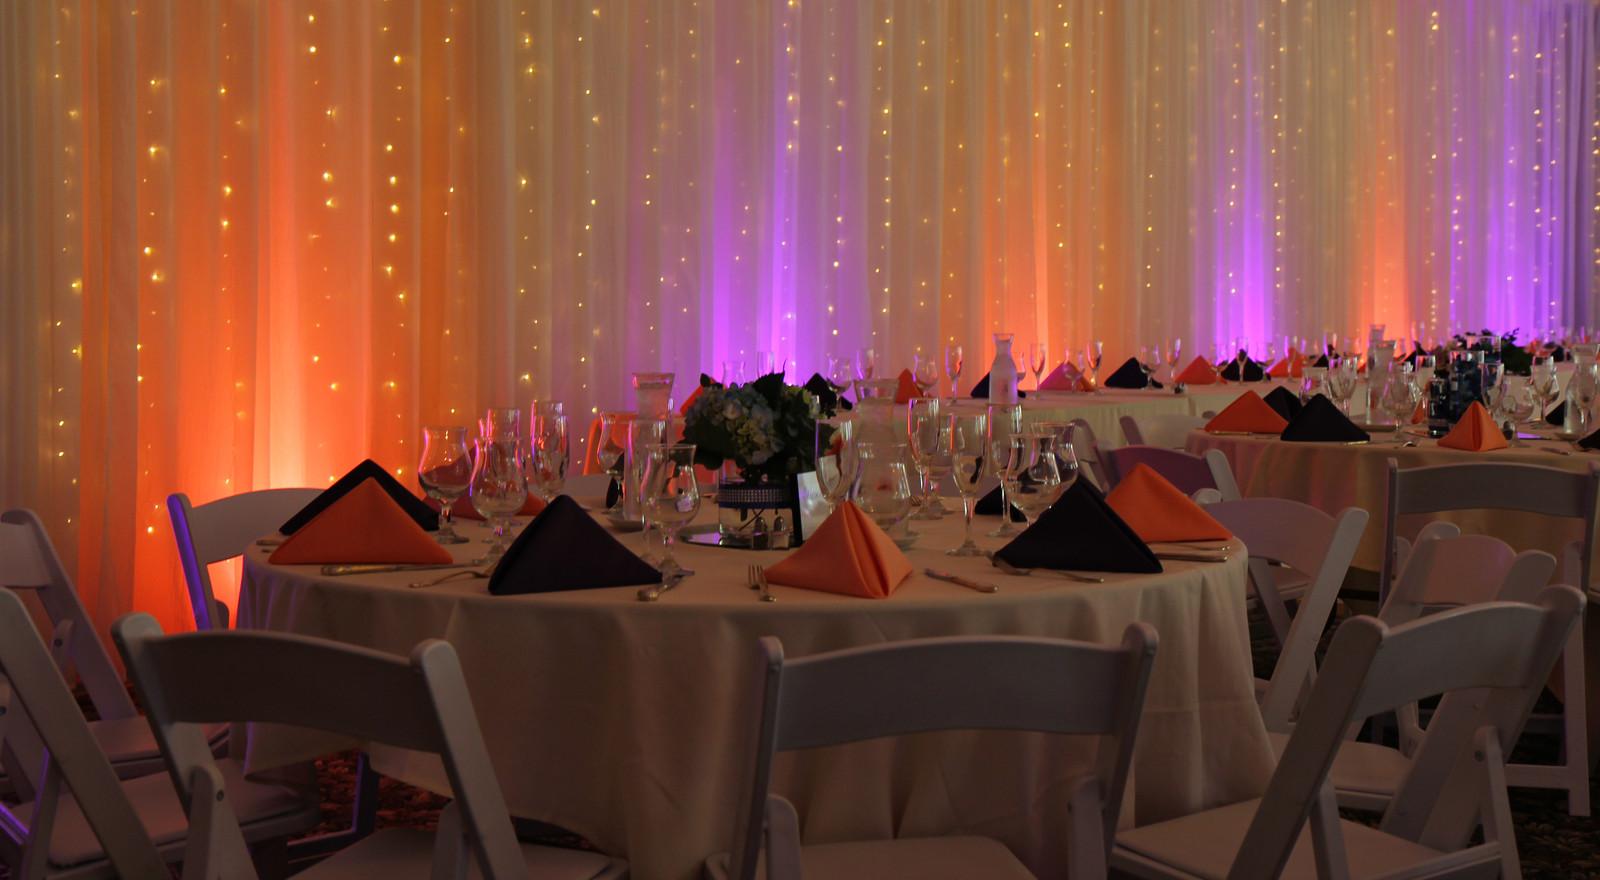 Wedding Decor | Uplights | Pipe & Drape | Twinkle Lights | Ken Caryl